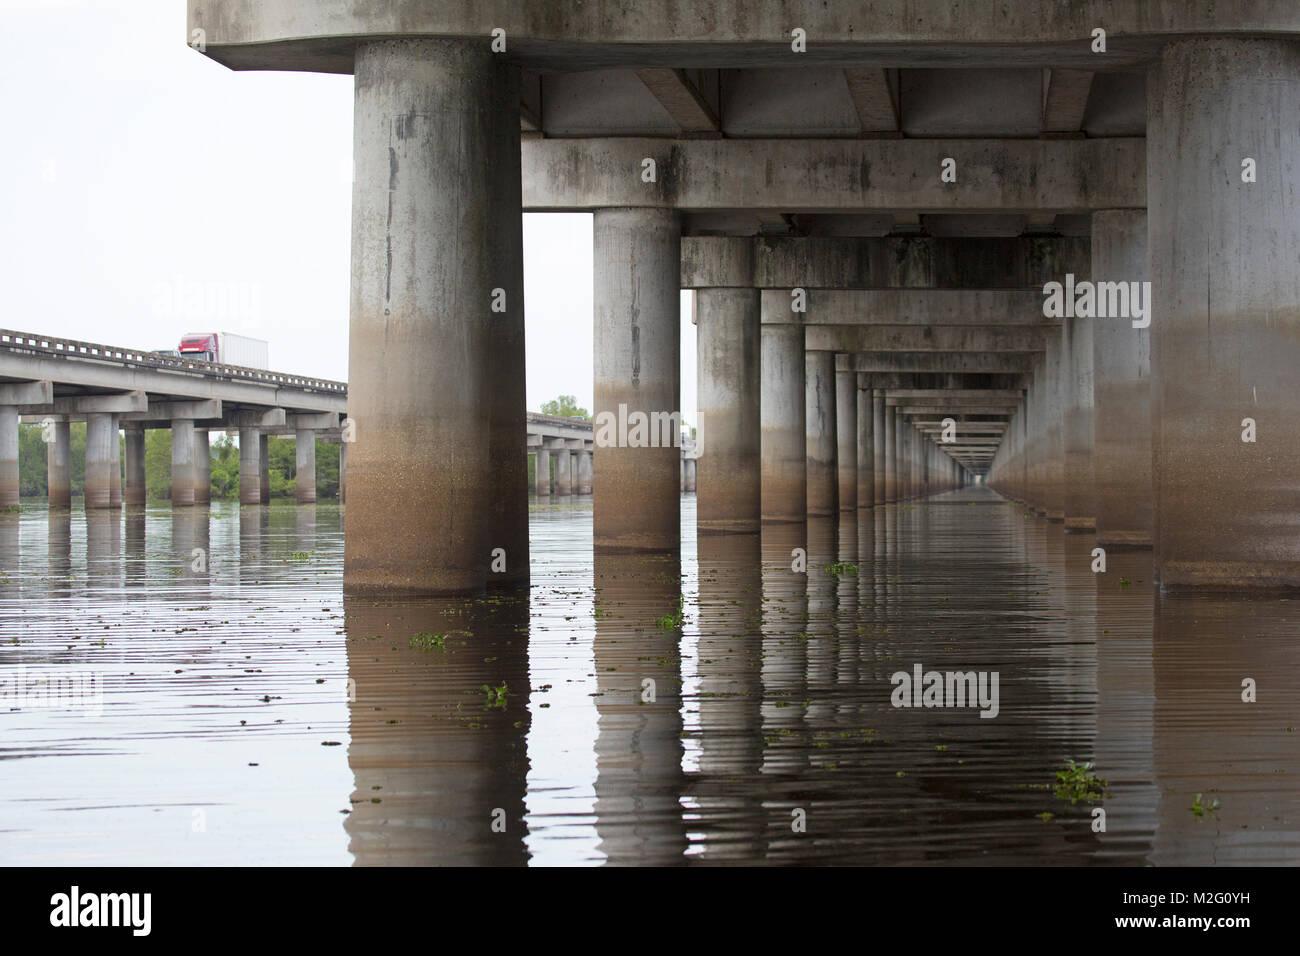 Palude Atchafalaya autostrada, un 18.2 miglio ponte che attraversa la zona umida sulla Interstate 10 (I-10) autostrada Immagini Stock